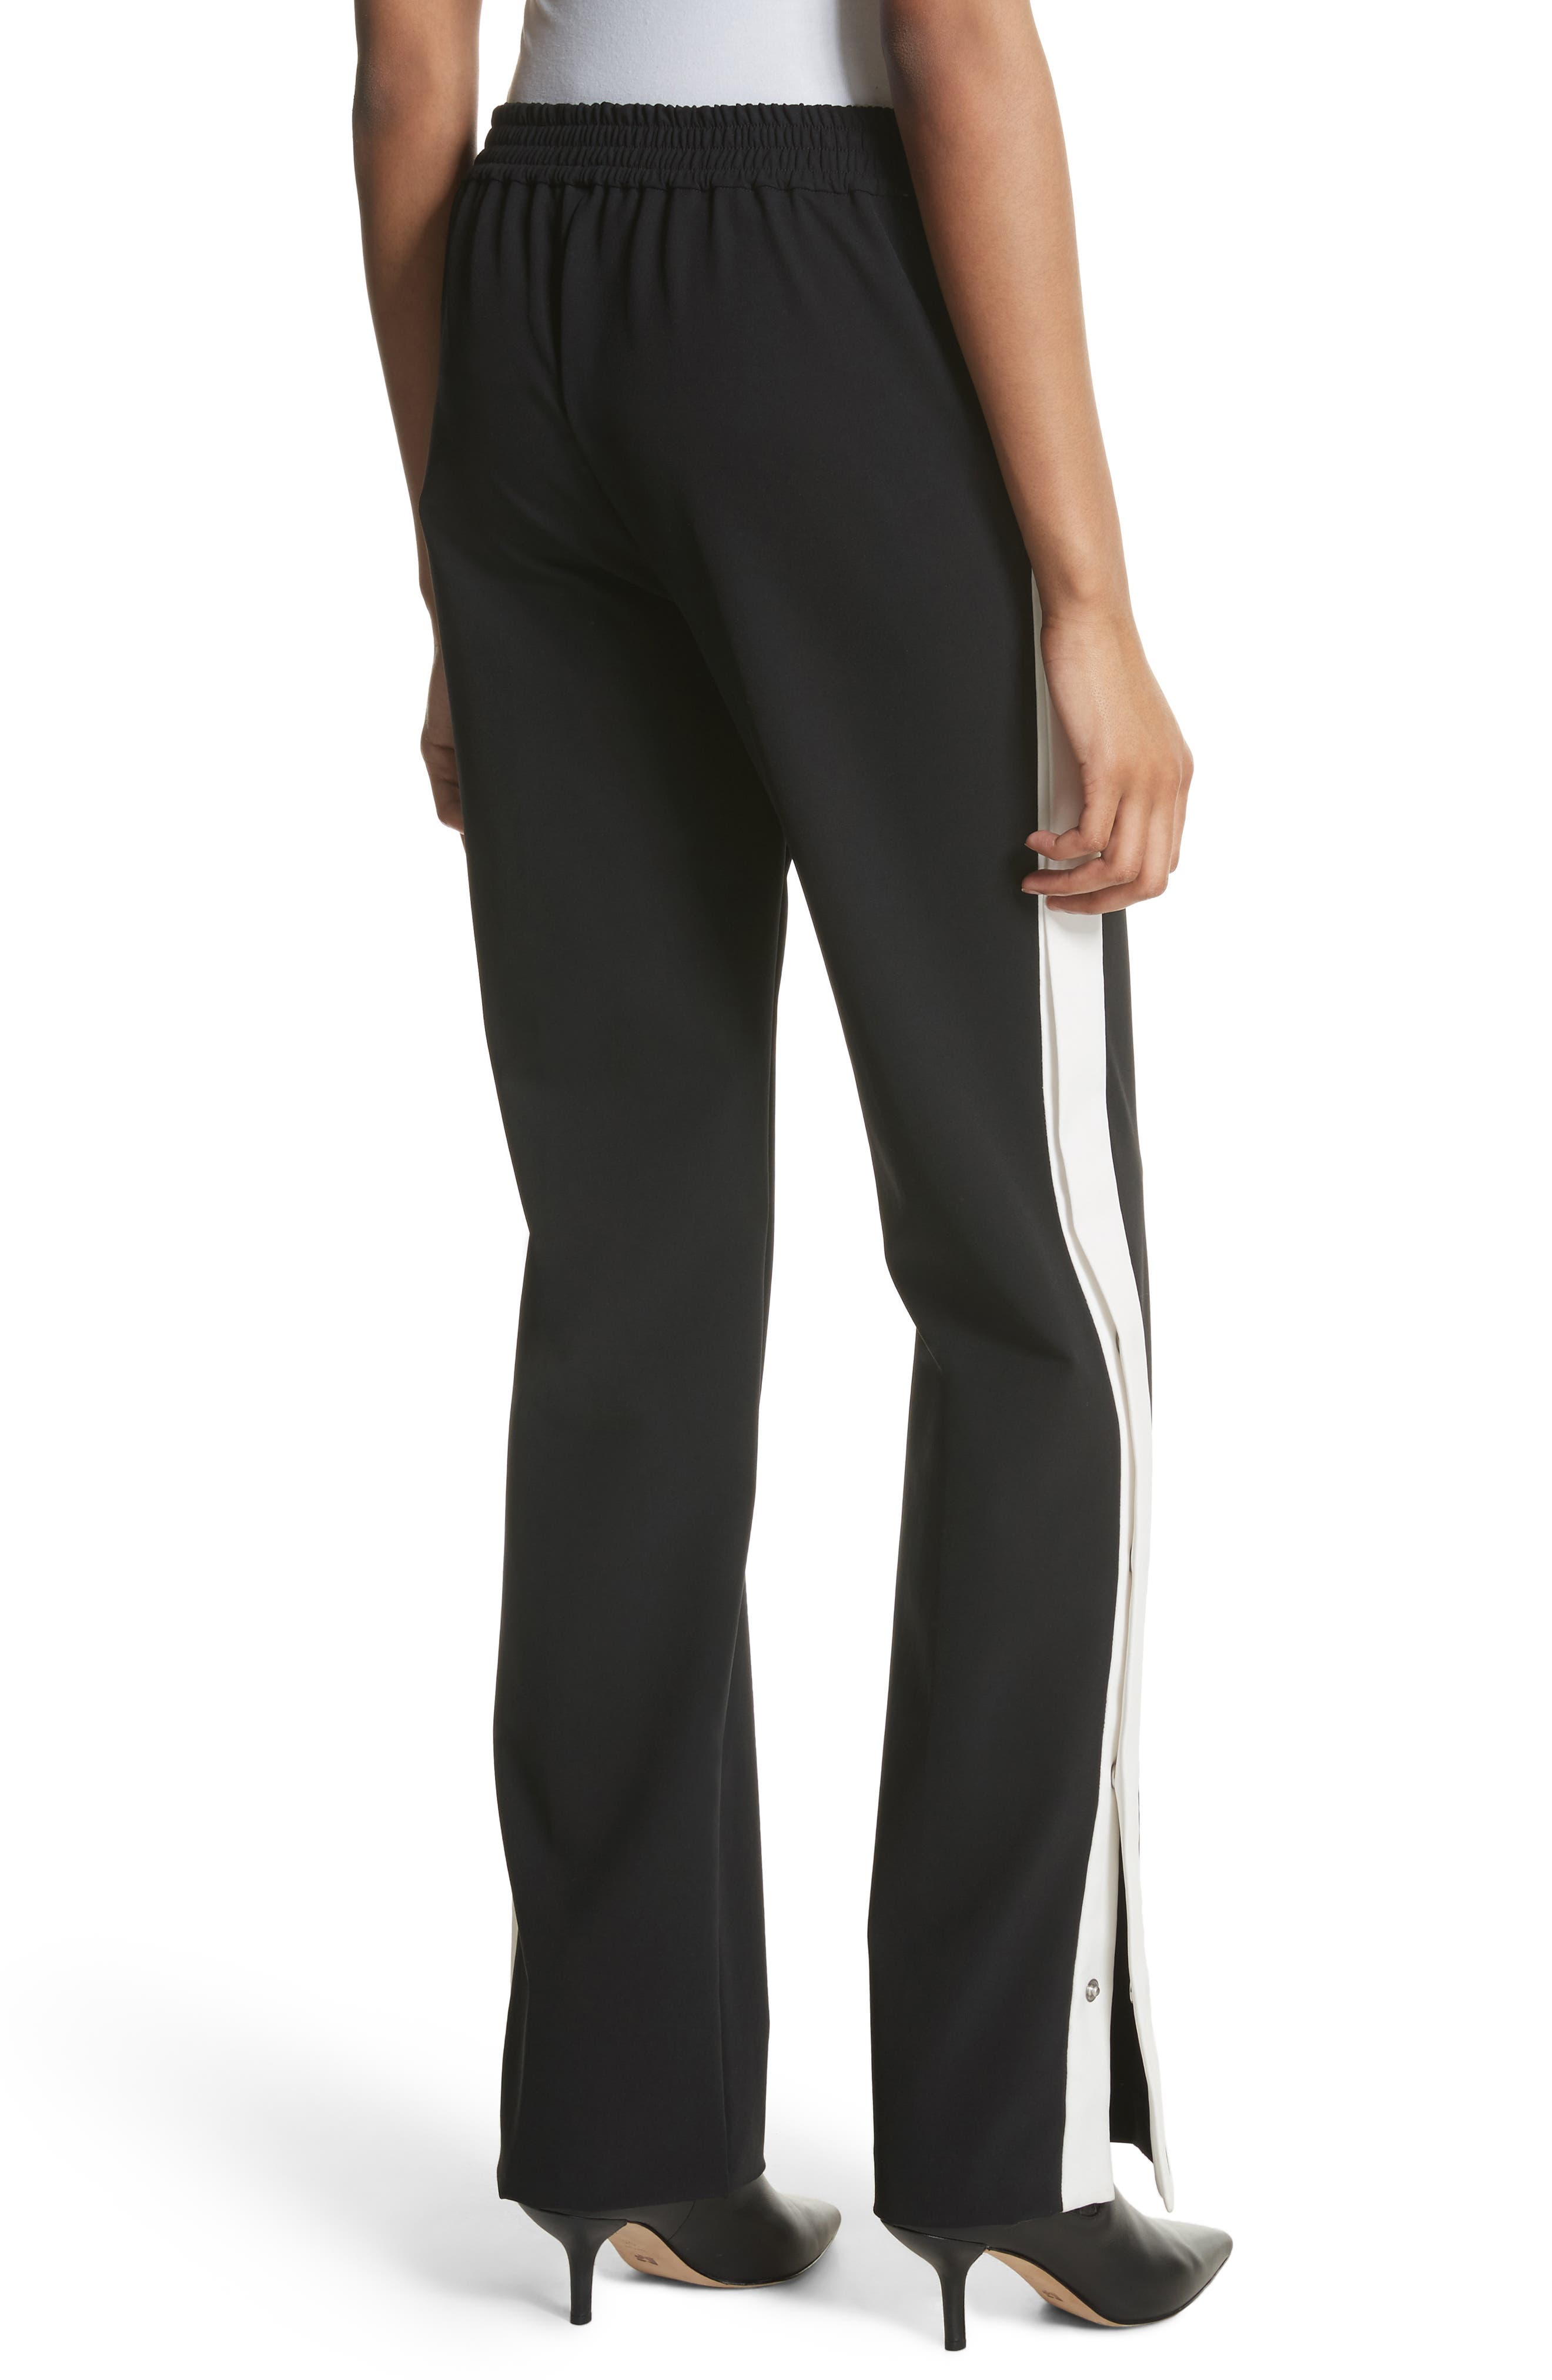 Snap Side Track Pants,                             Alternate thumbnail 2, color,                             Black/ Ivory